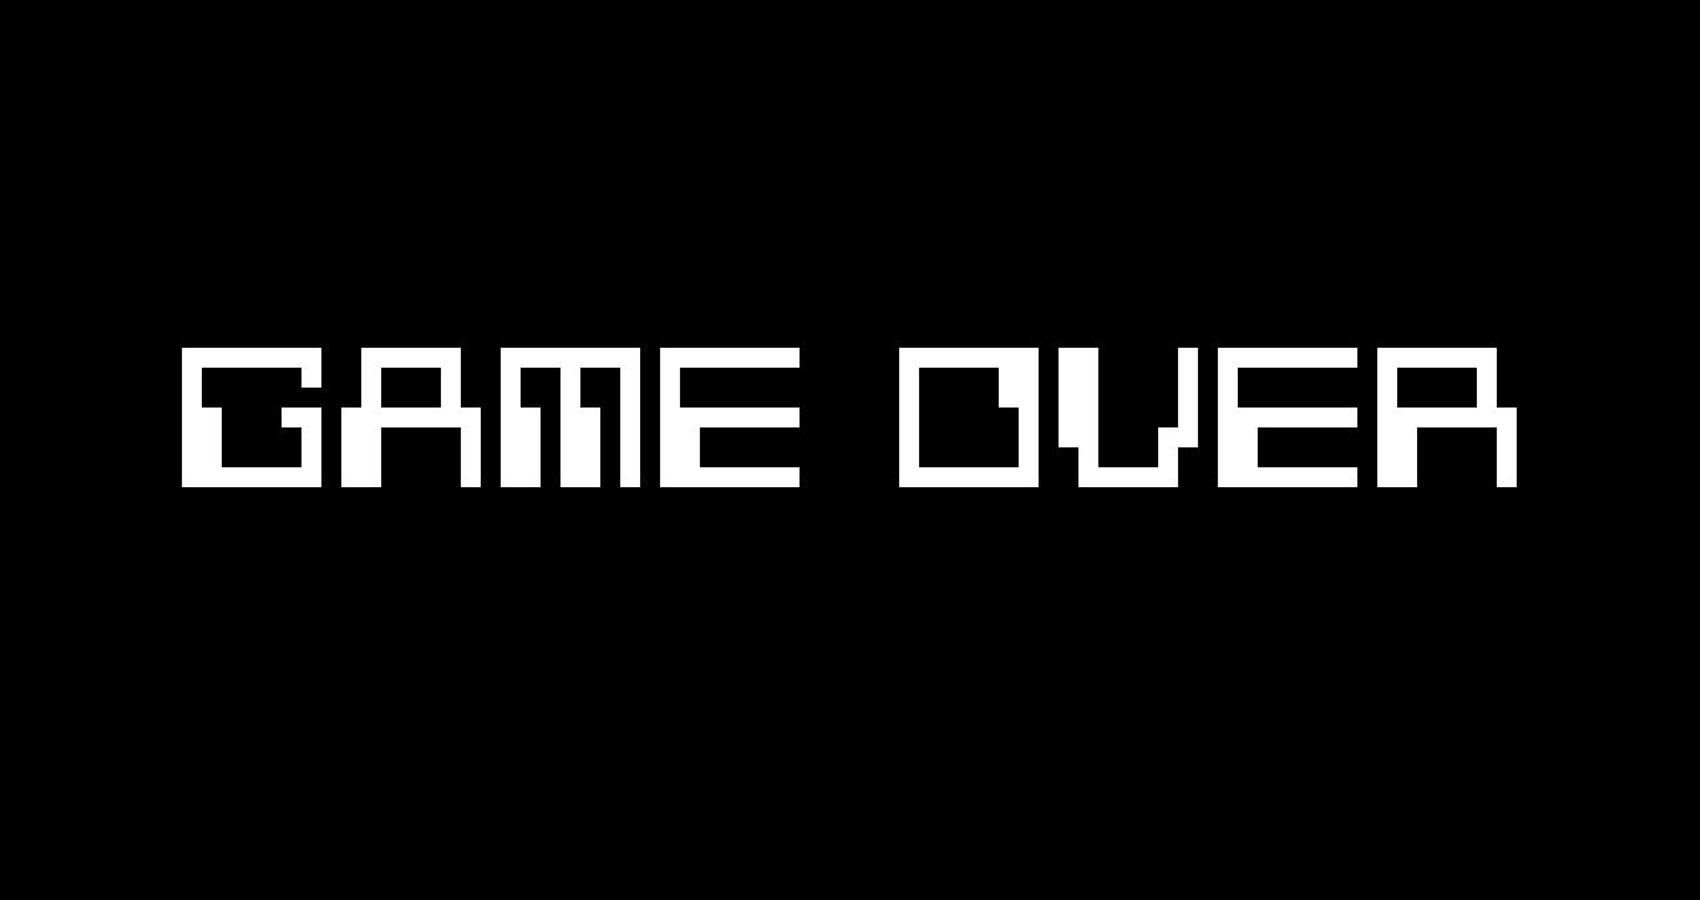 Game Over written by Belén Olavarría at Spillwords.com